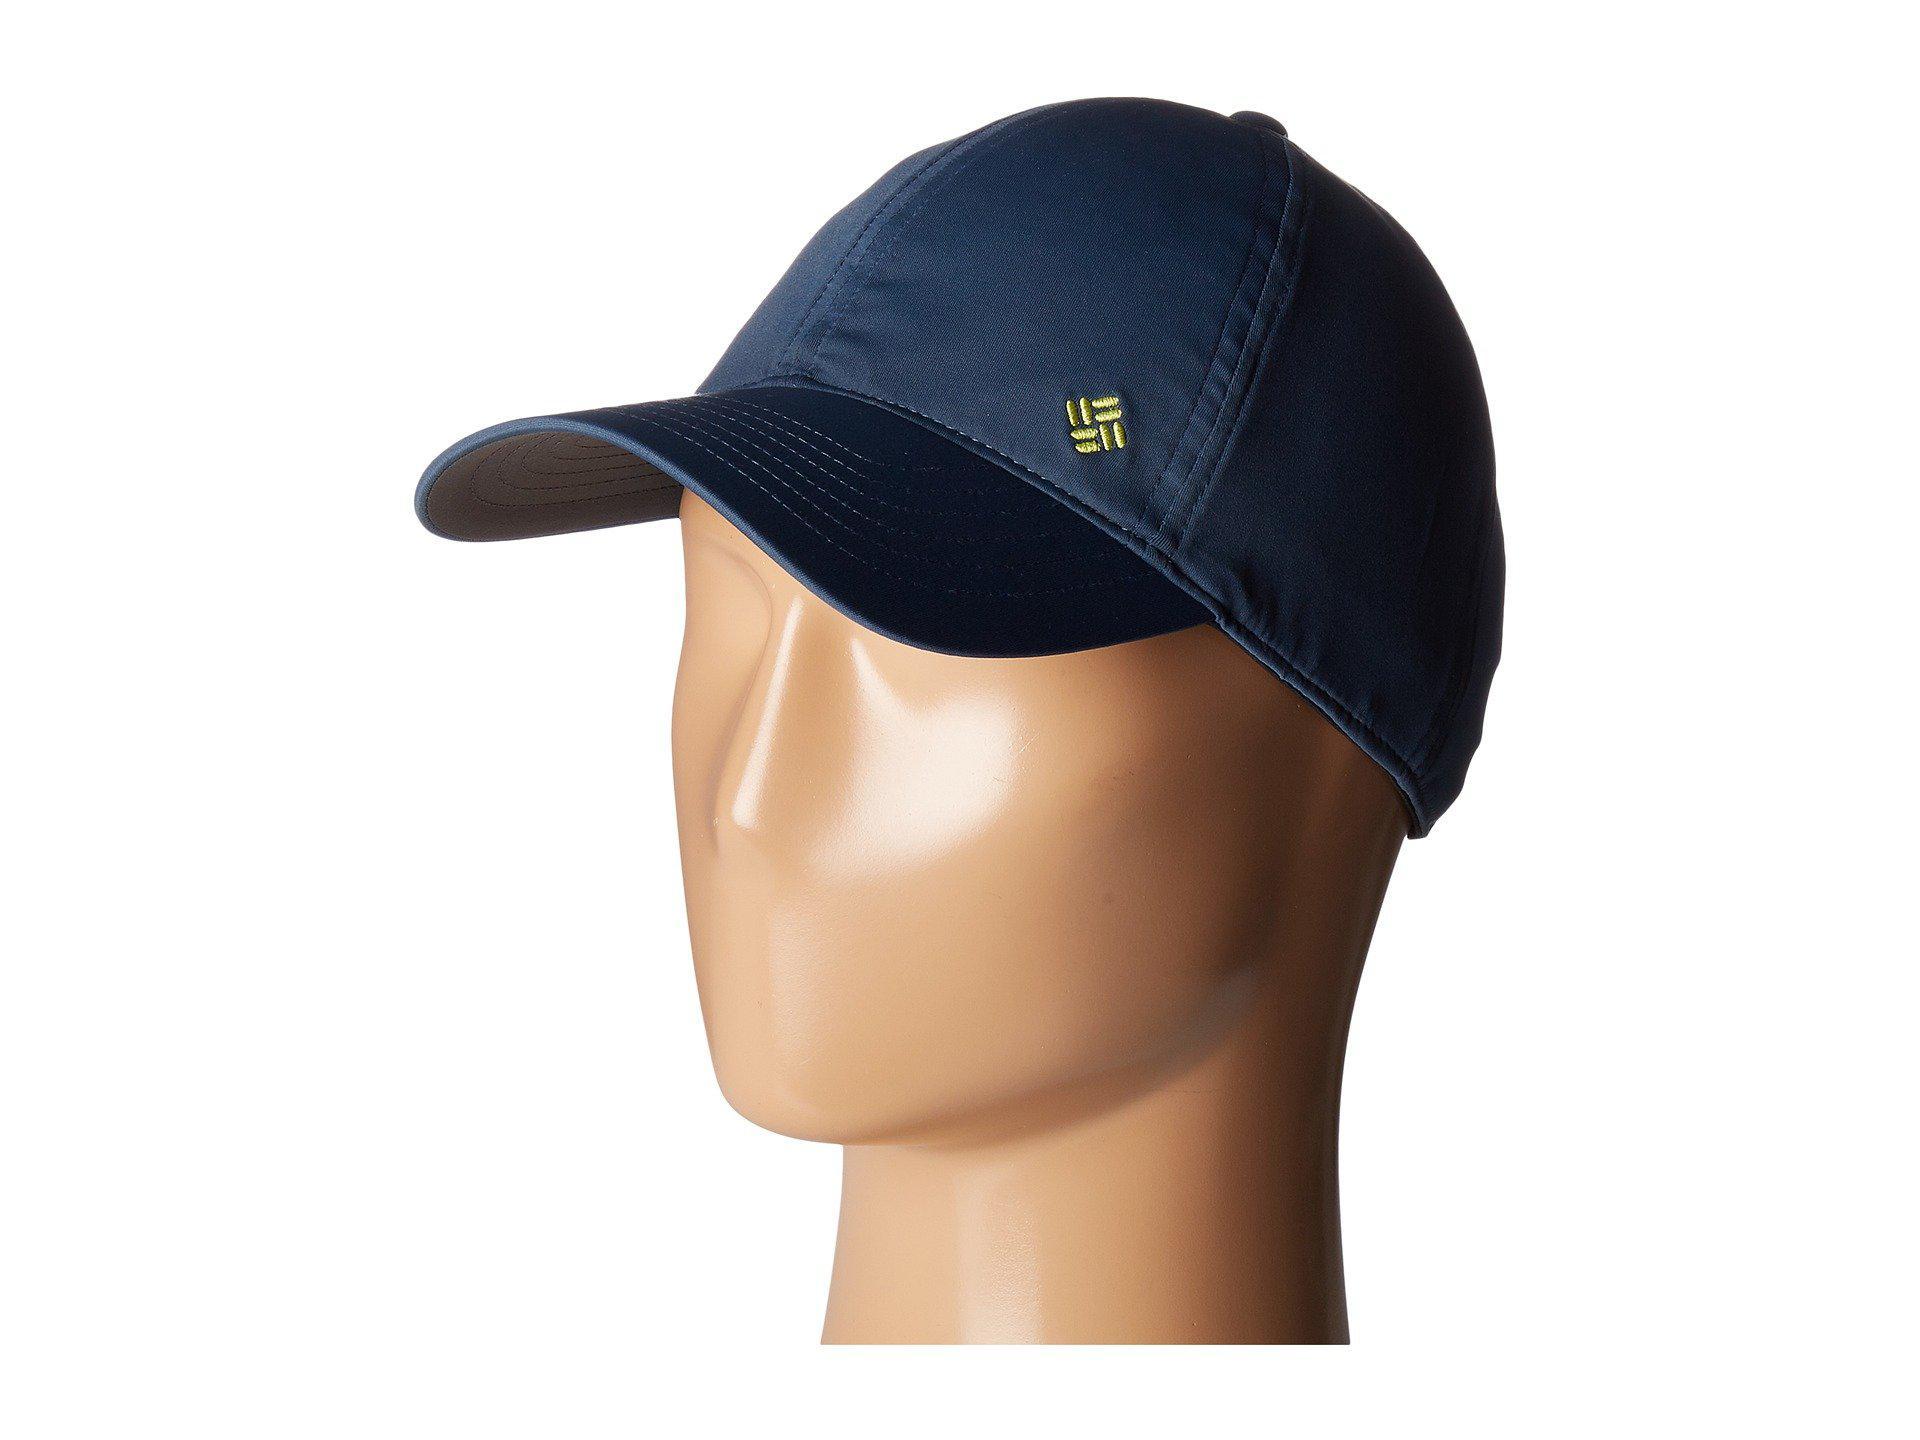 555da438b6bba Columbia Coolhead Ballcap Iii in Blue for Men - Lyst